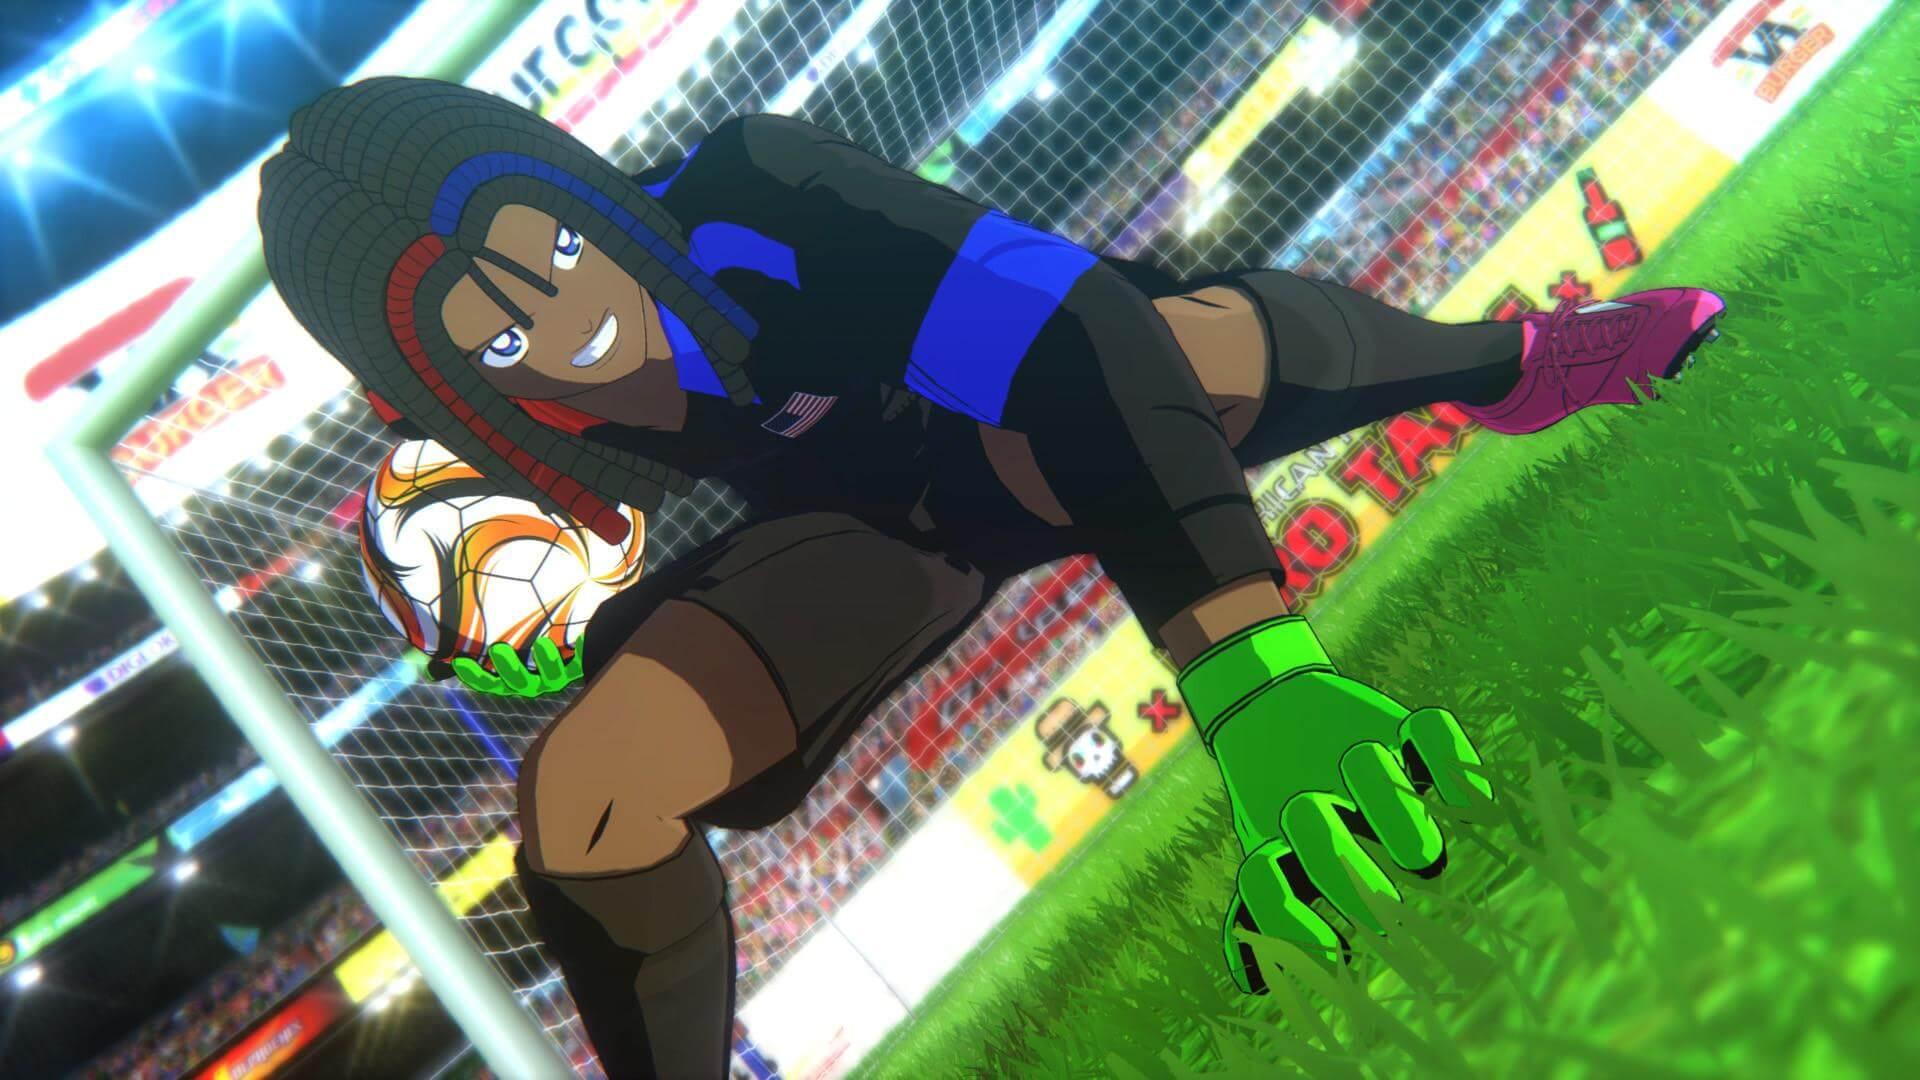 Скриншот из игры Captain Tsubasa: Rise of New Champions